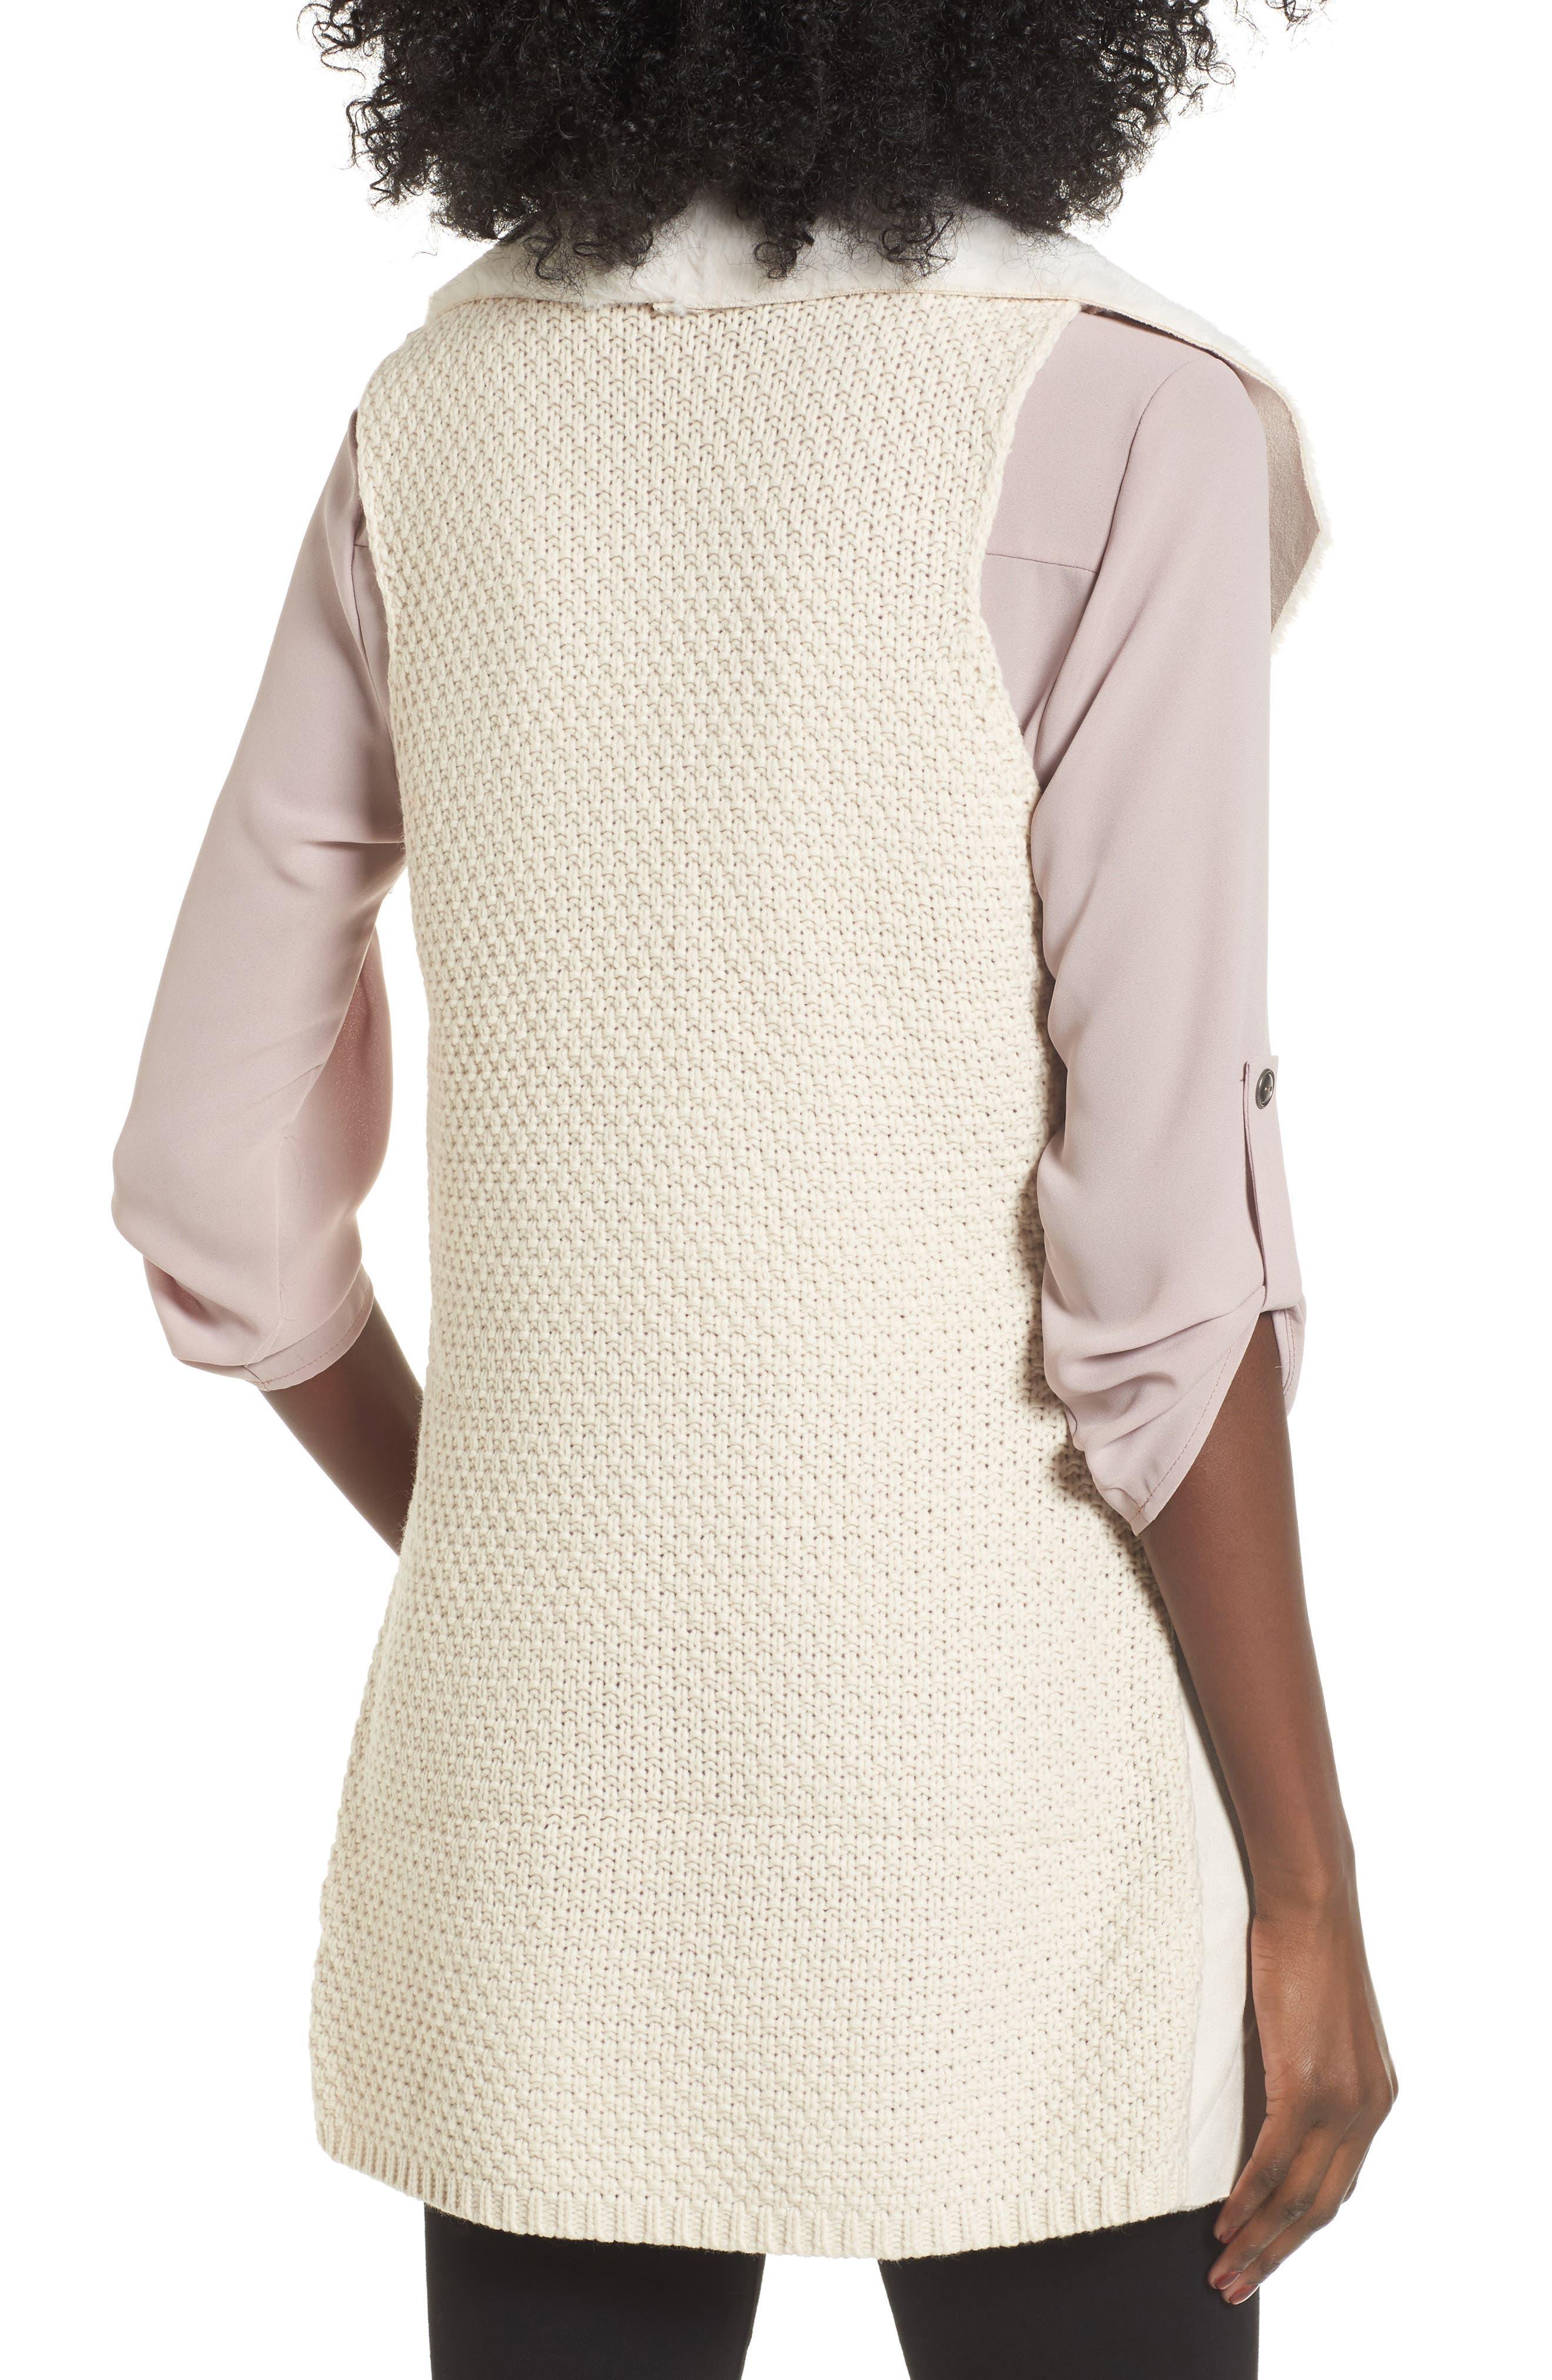 Faux Shearling Vest,                             Alternate thumbnail 2, color,                             Ivory